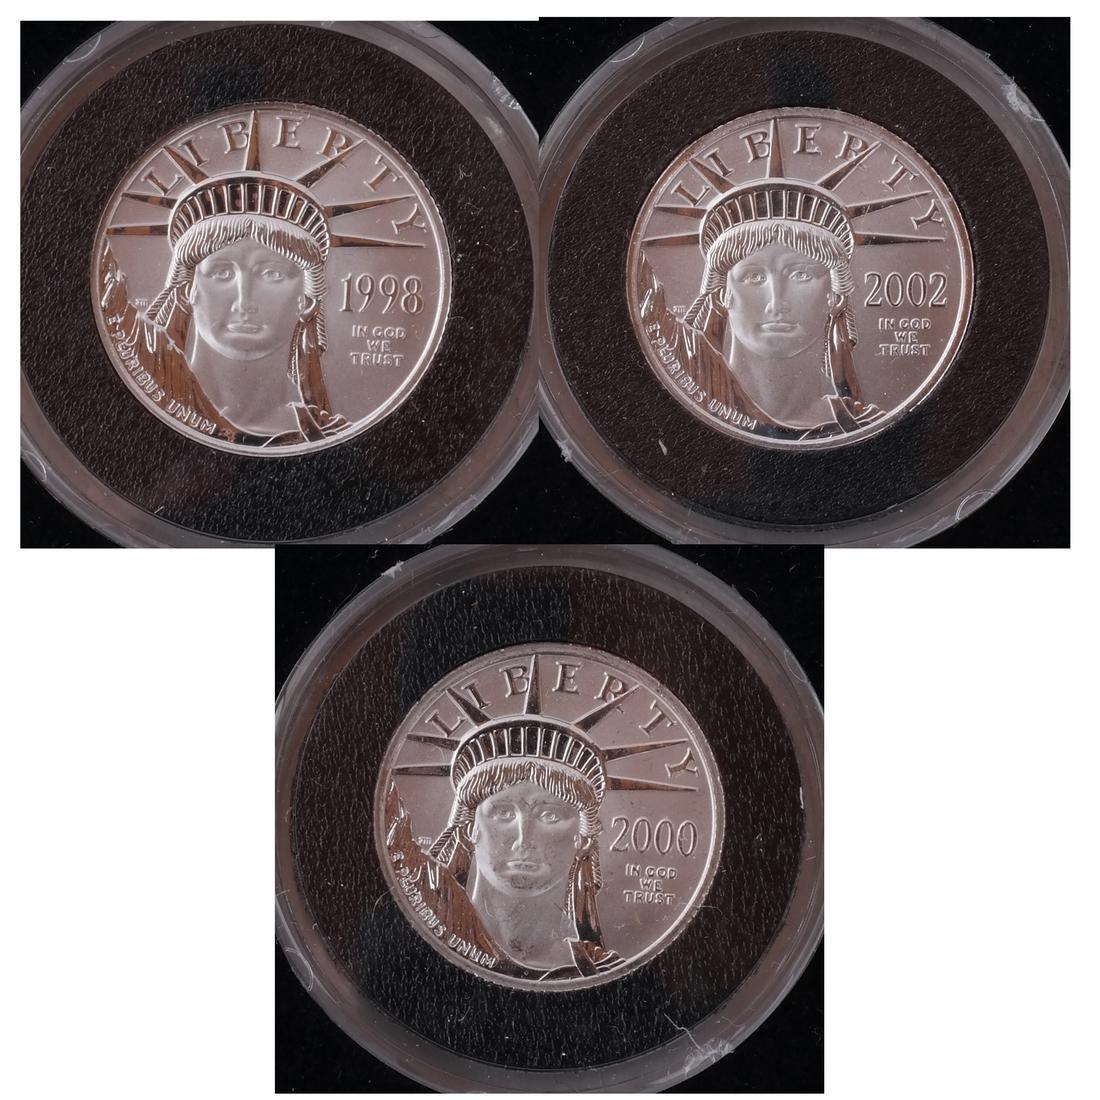 3 Platinum 1/4-Oz. Coins, '98, '00, '02